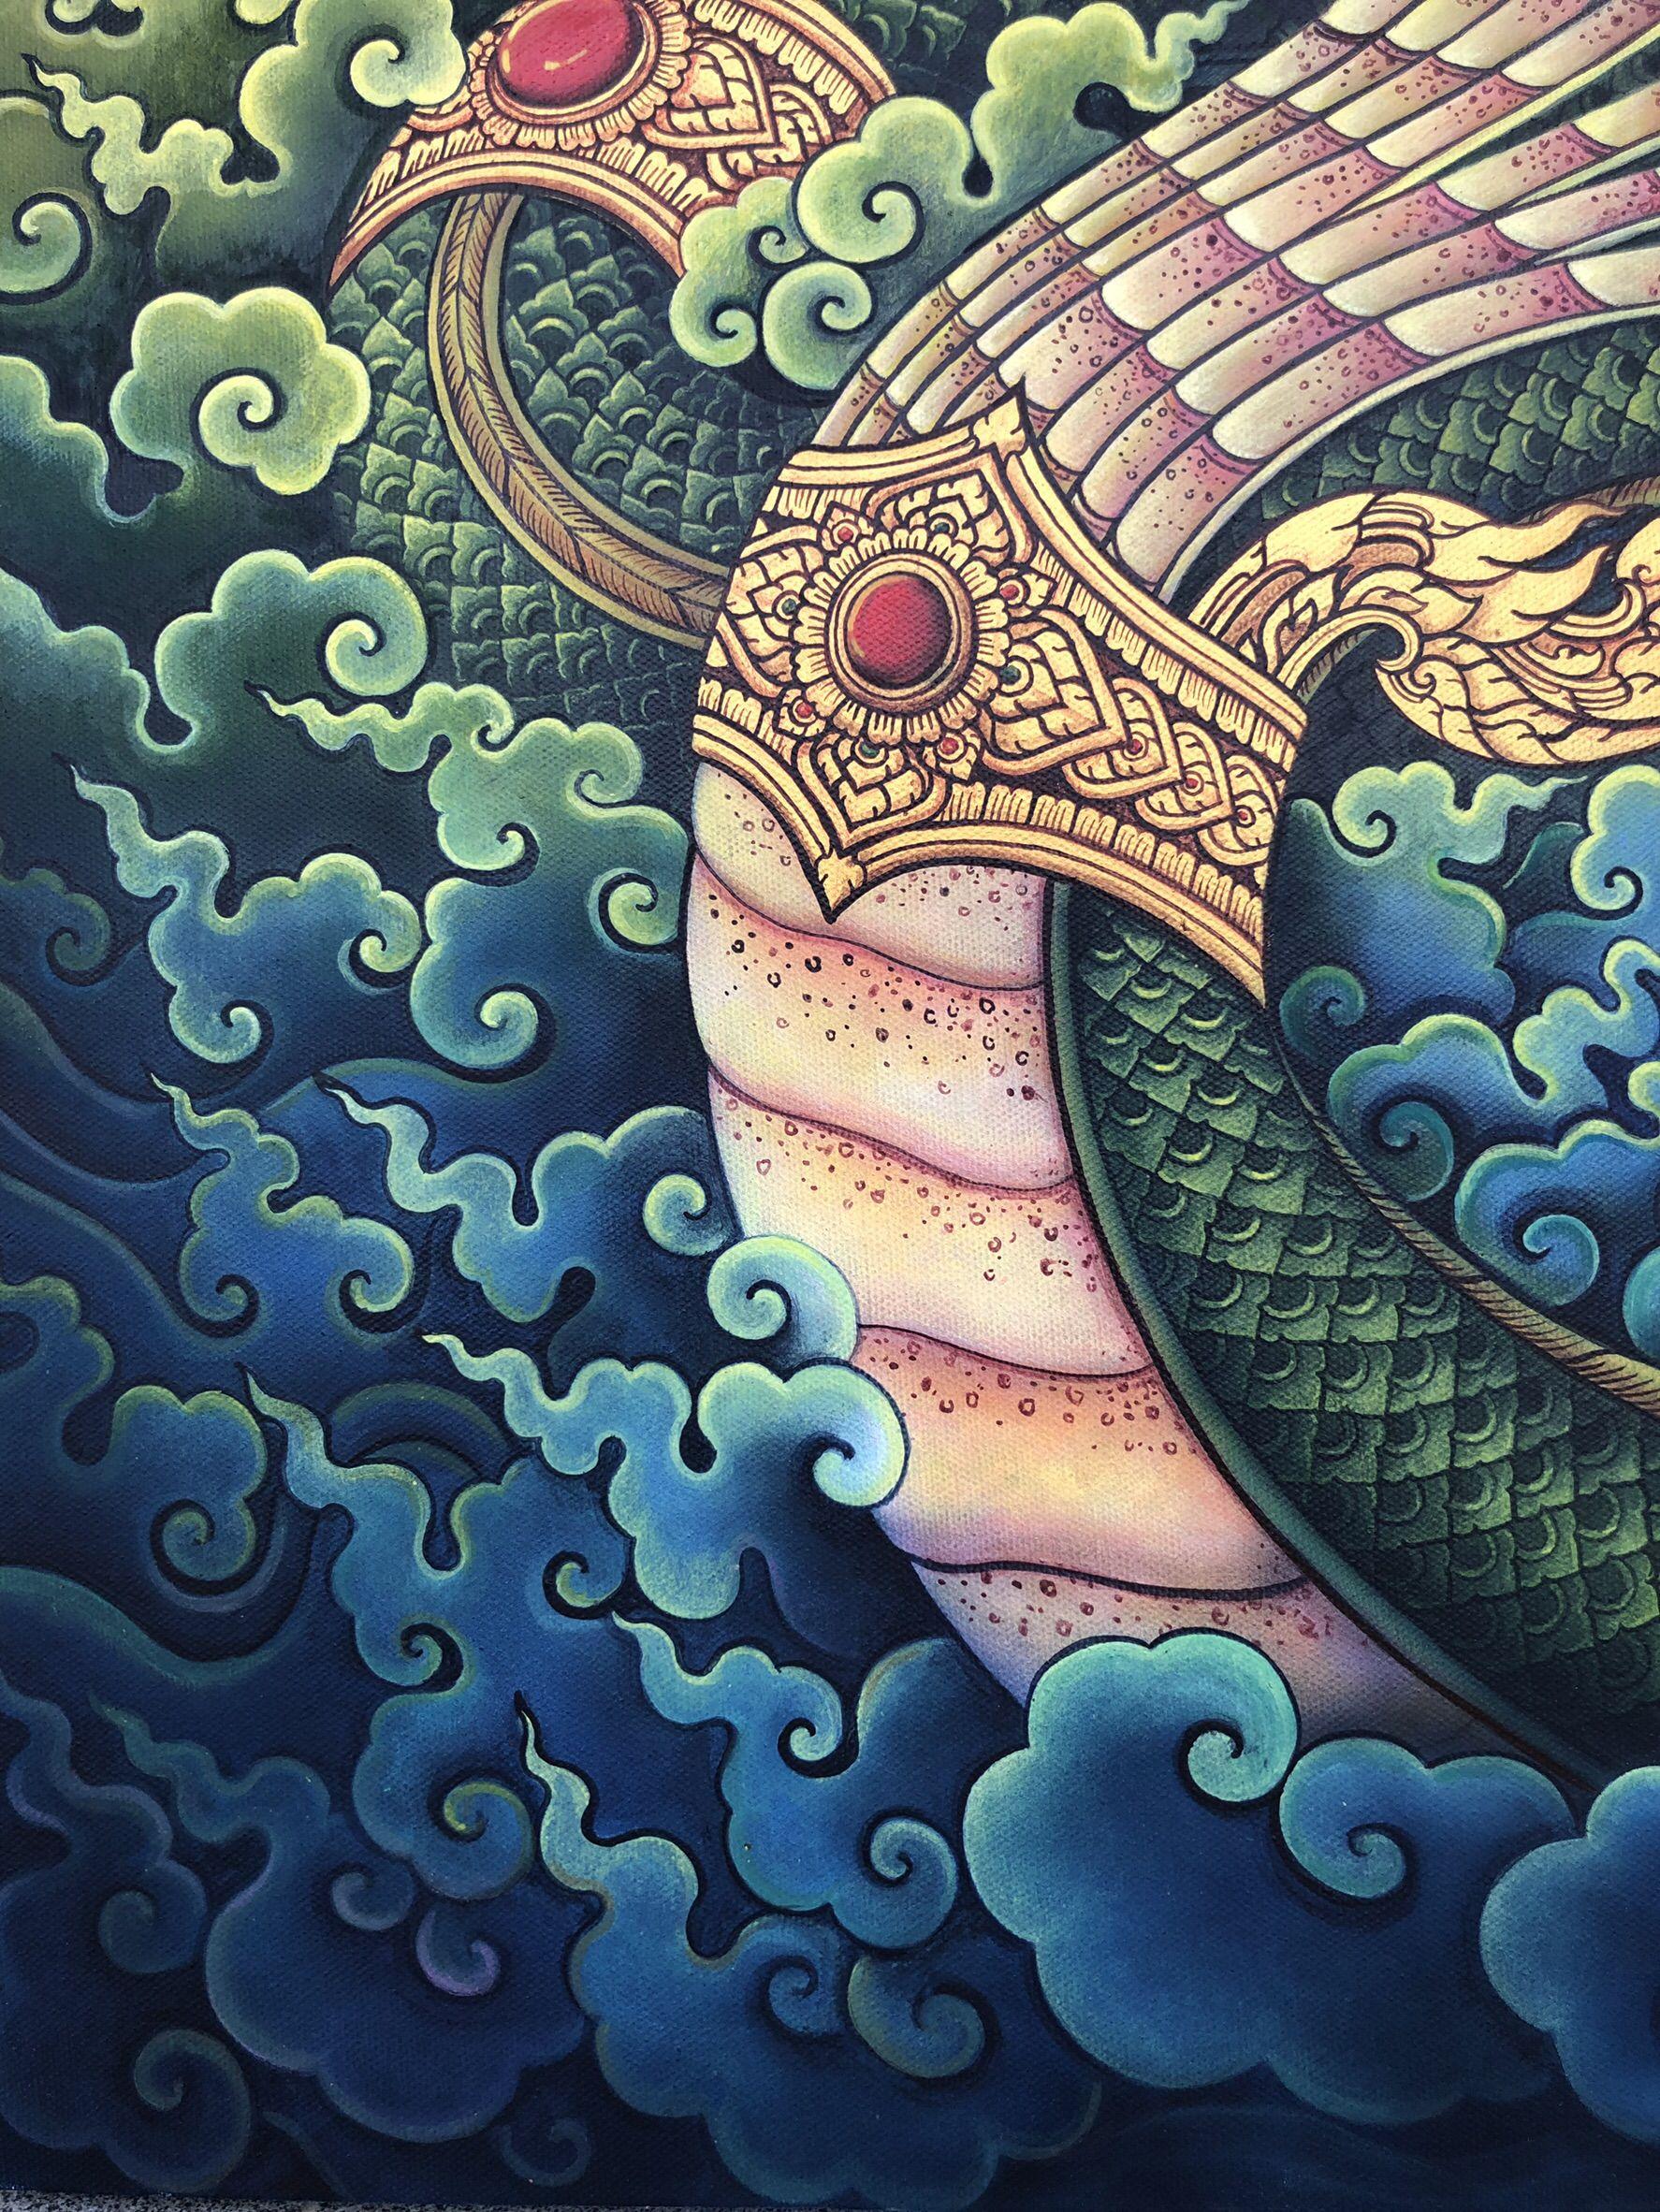 Plabpluengsgallery Artgallery Kunst Kunsthandwerk Artwork Thaiart Kingofnagas Acrylmalerei Acrylpainting Painting พญานาค พญา ศ ลปะ บรรพศ ลป ภาพวาด